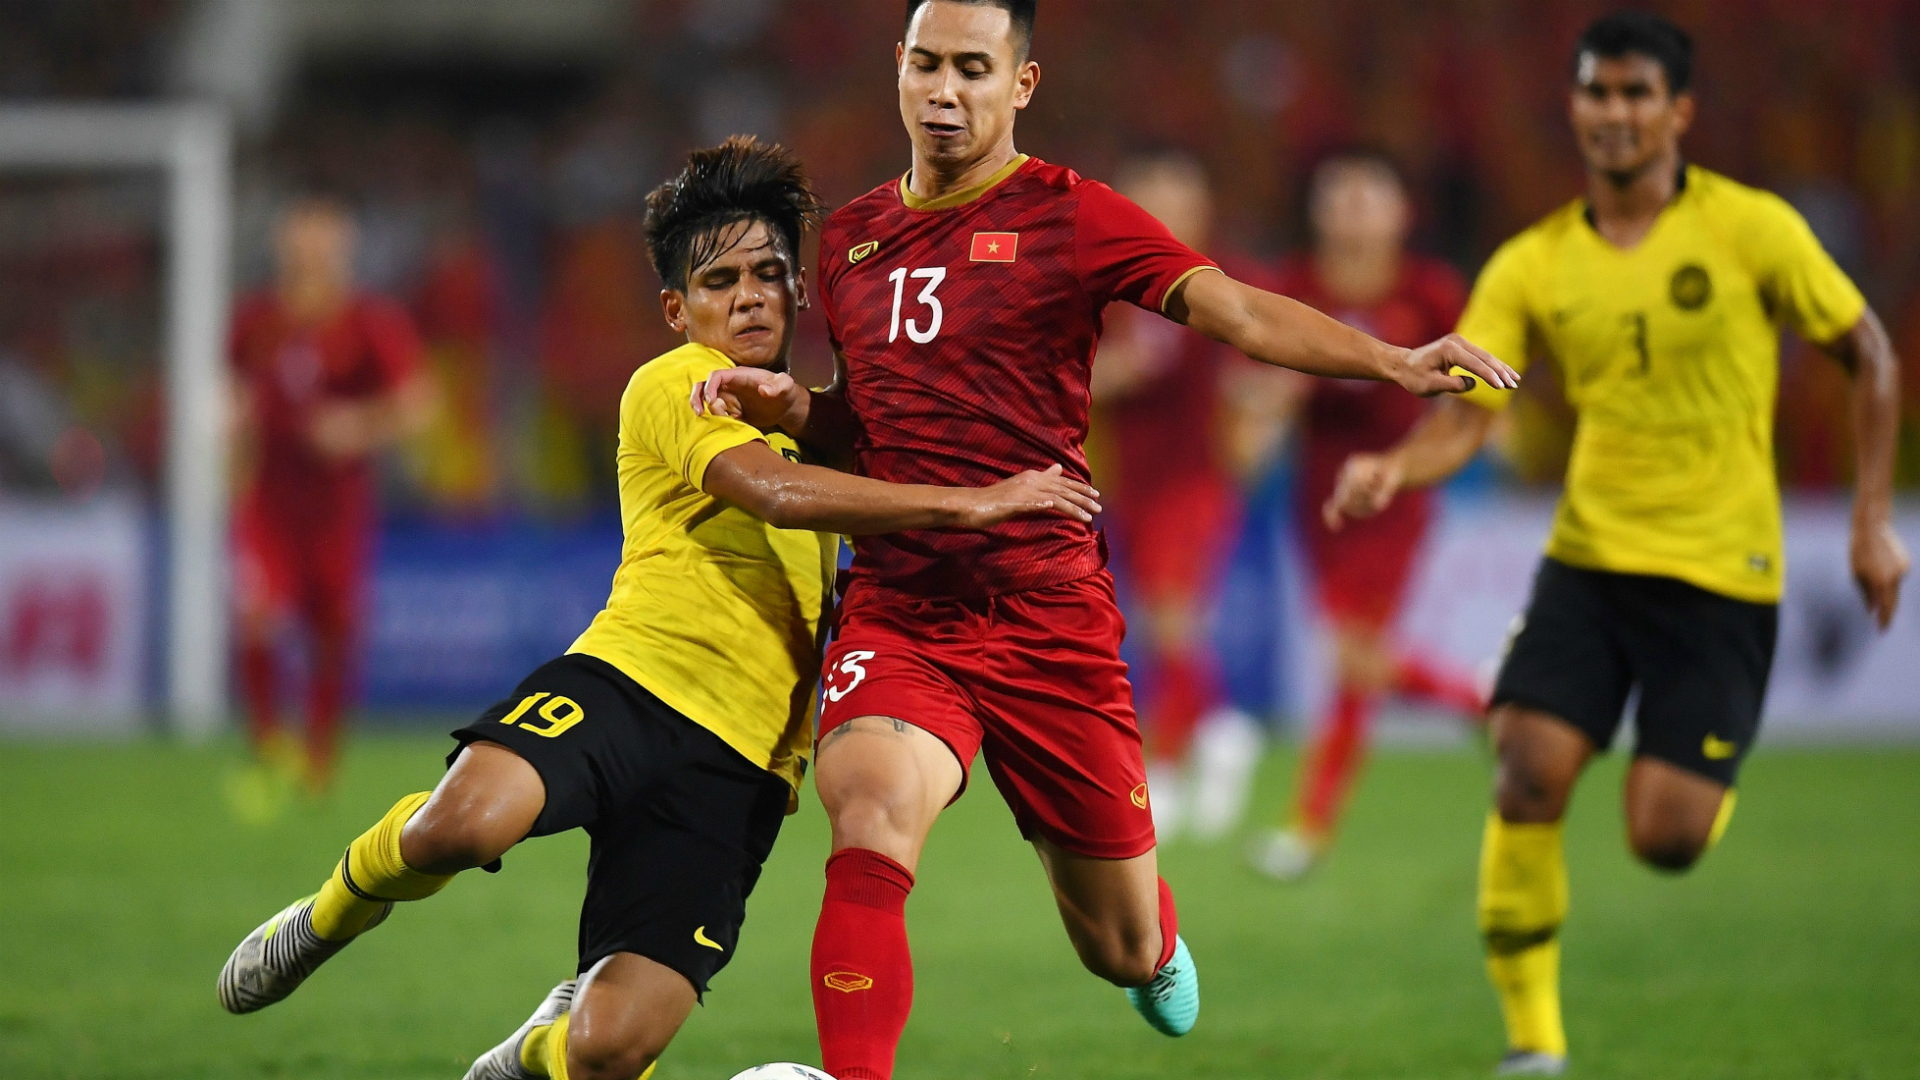 Akhyar Rashid, Vietnam v Malaysia, World Cup qualifier, 10 Oct 2019